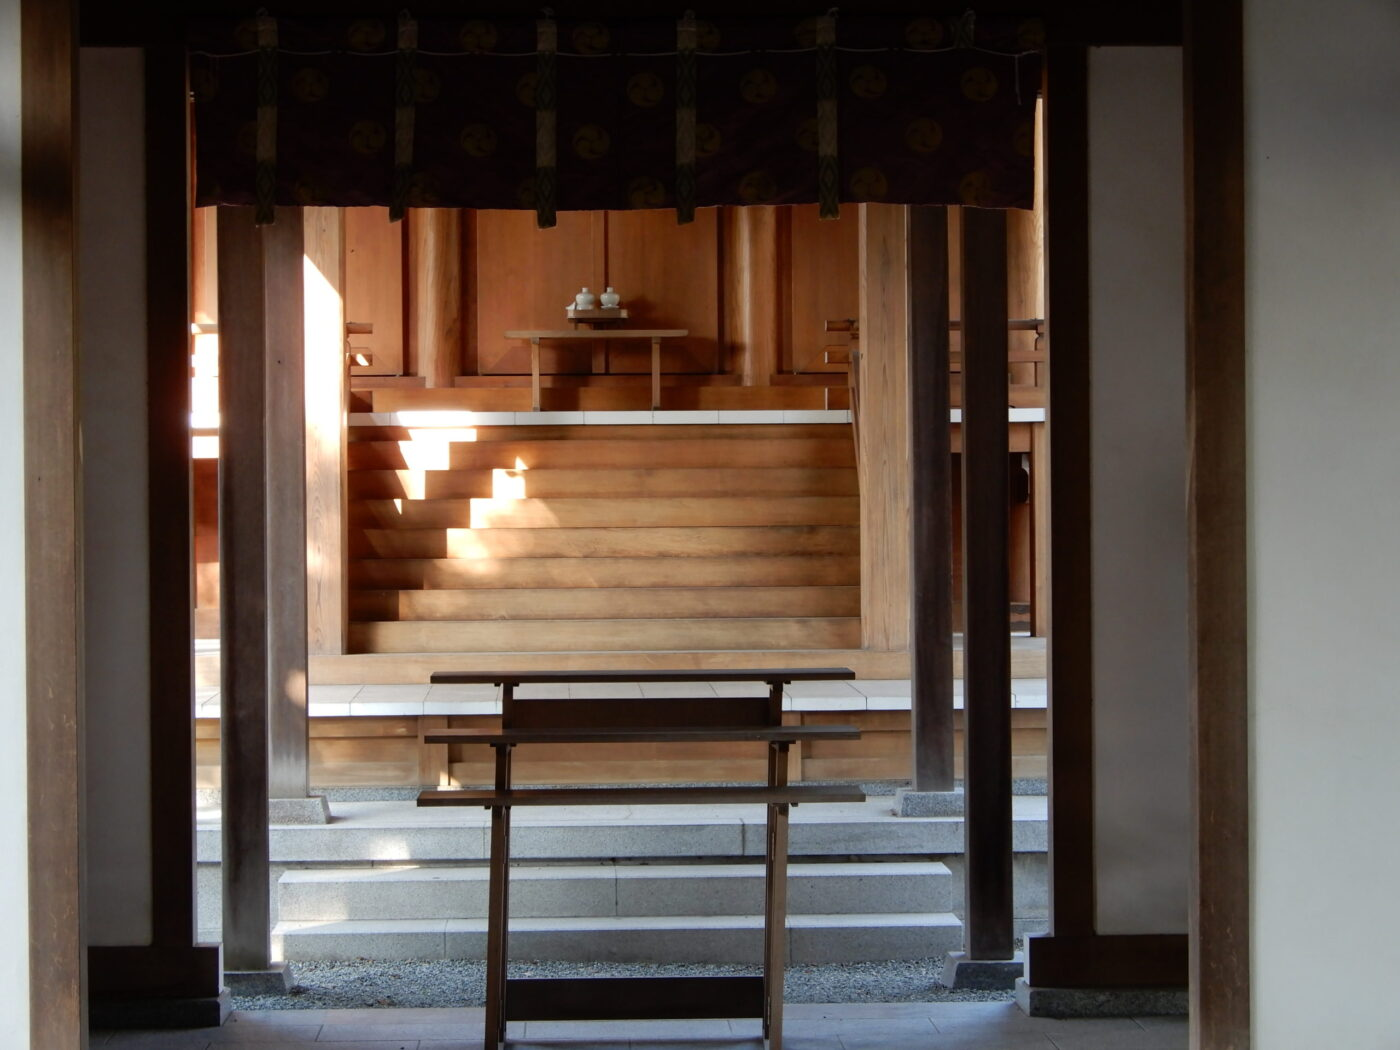 中村八幡宮の写真